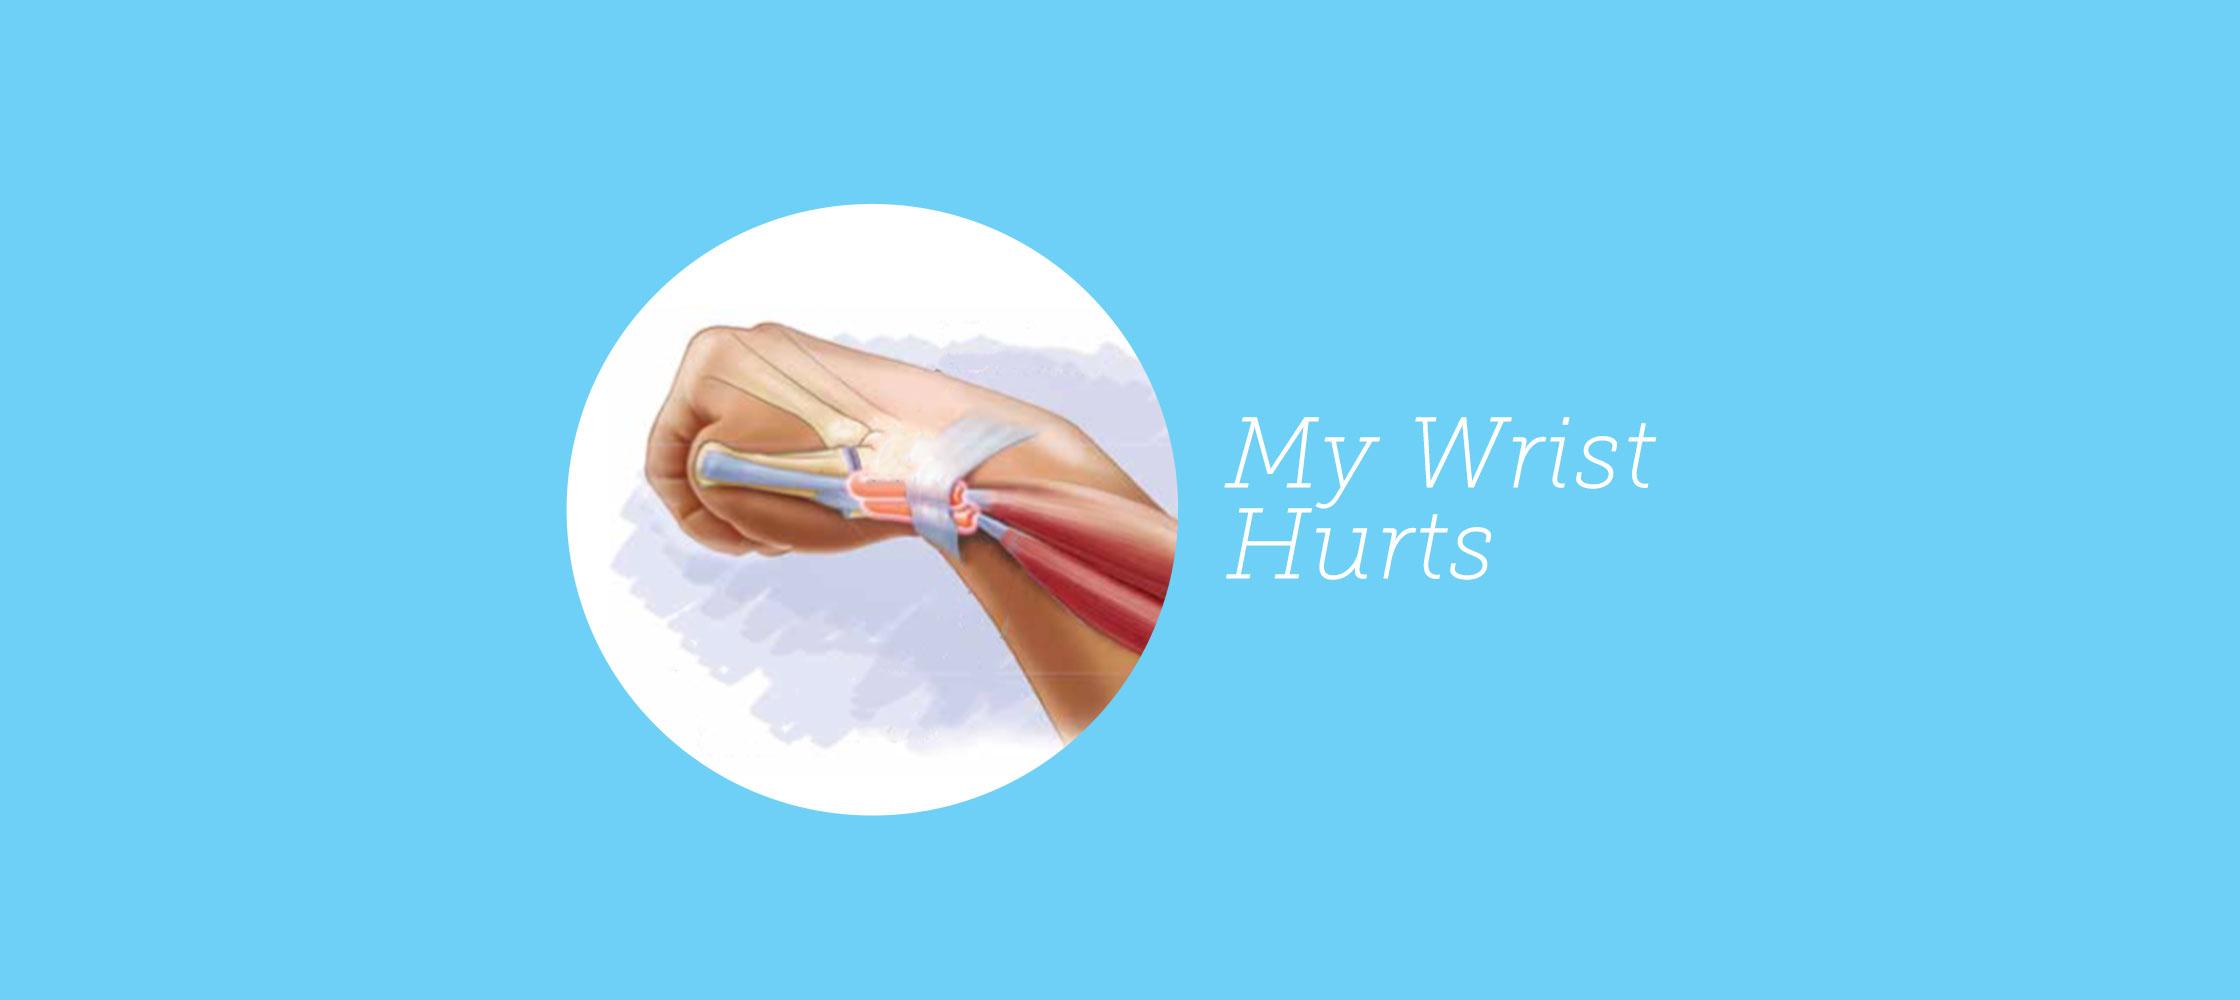 212-my-wrist-hurts